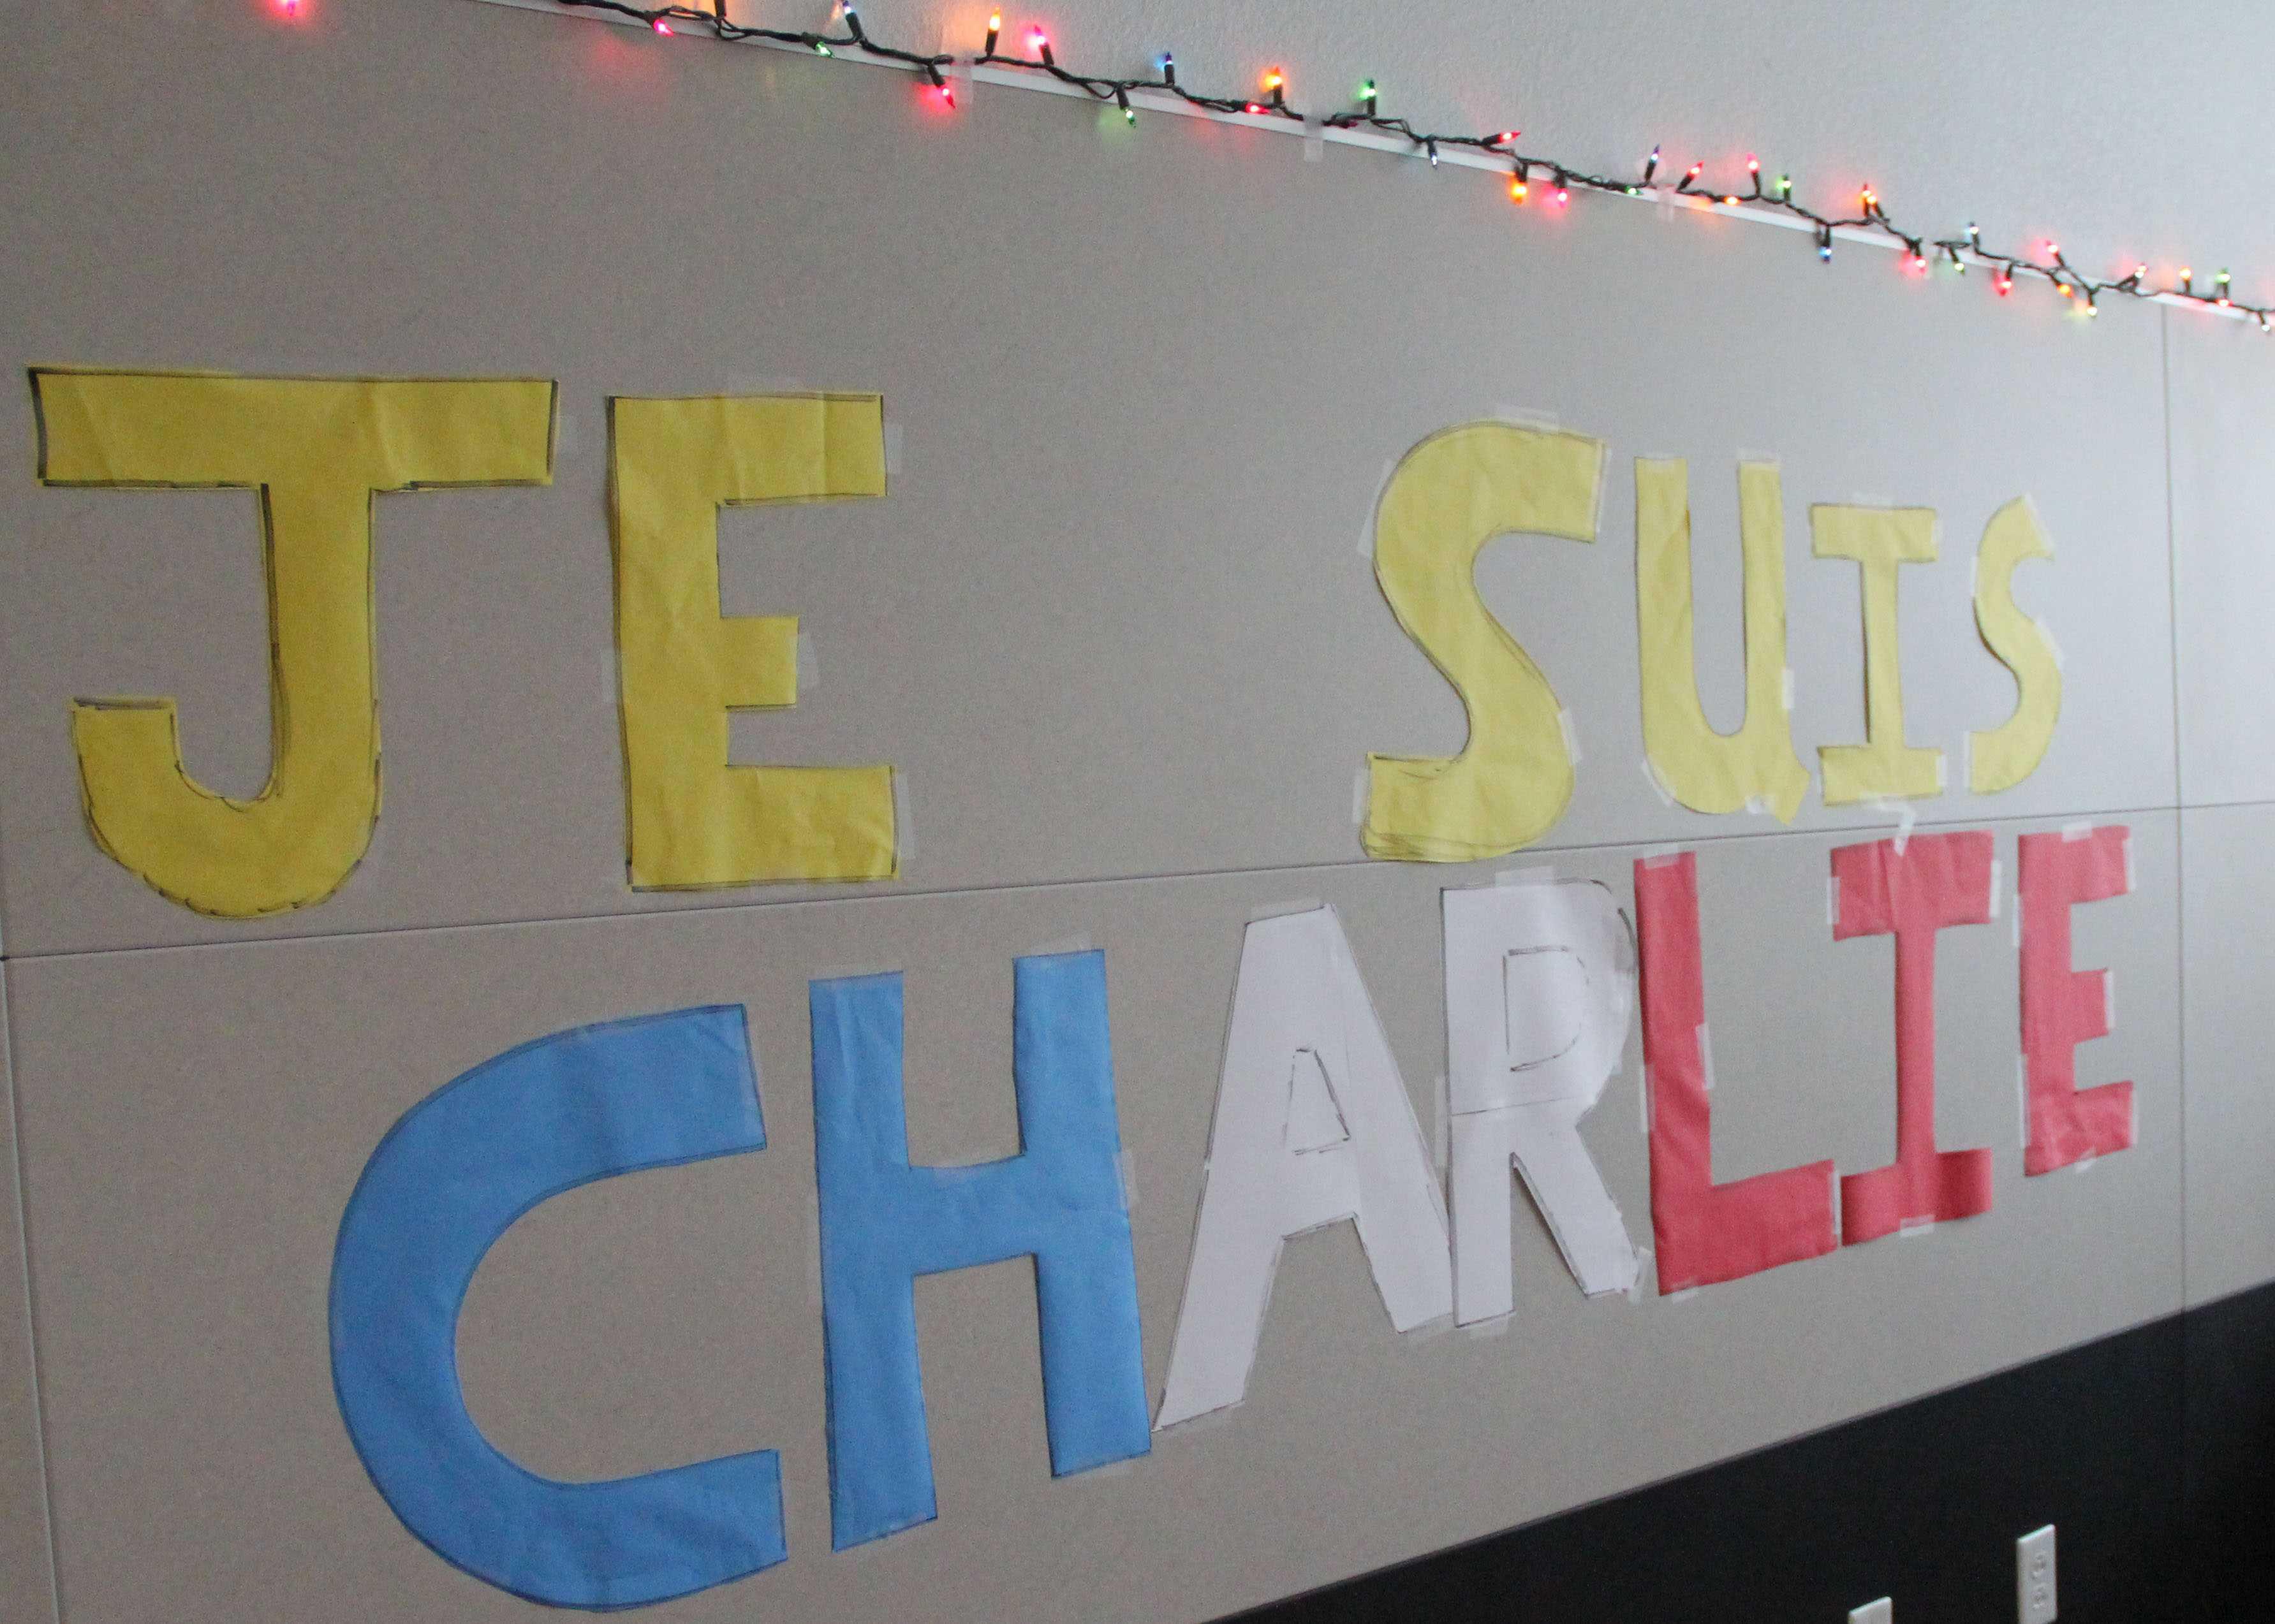 Decorations honoring the terrorist victims in Paris